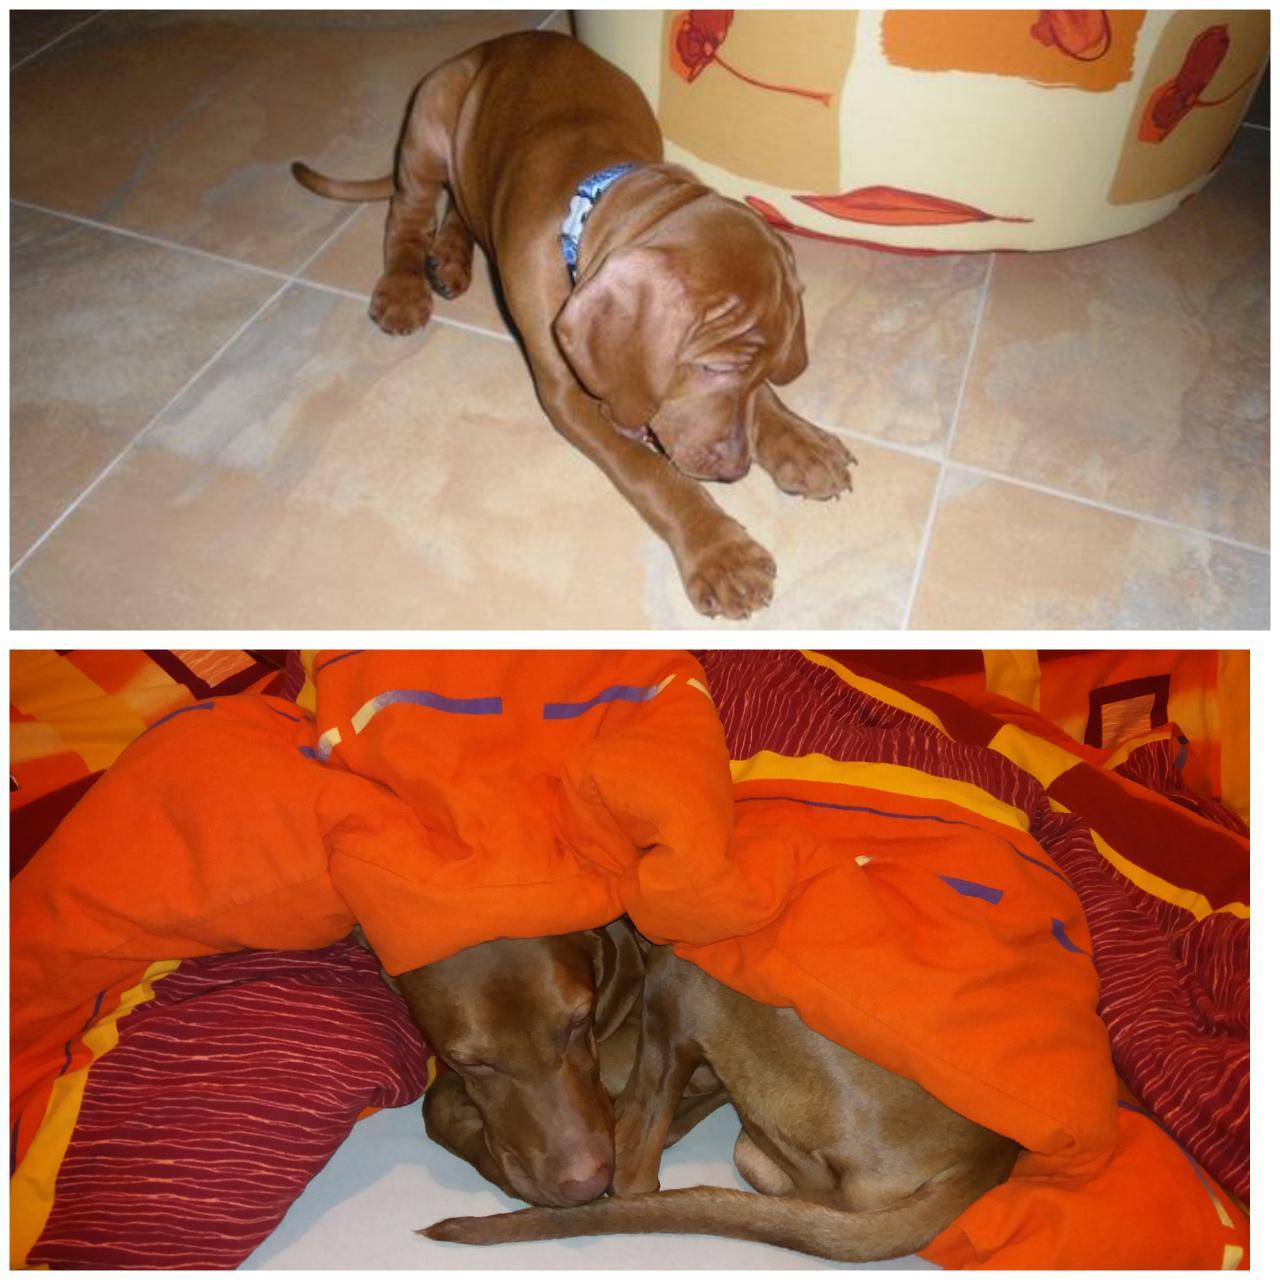 Rok 2017 u nás a po našem.... - Je to presne 5let,co jsme si domu prinesli nase psi miminko...☺